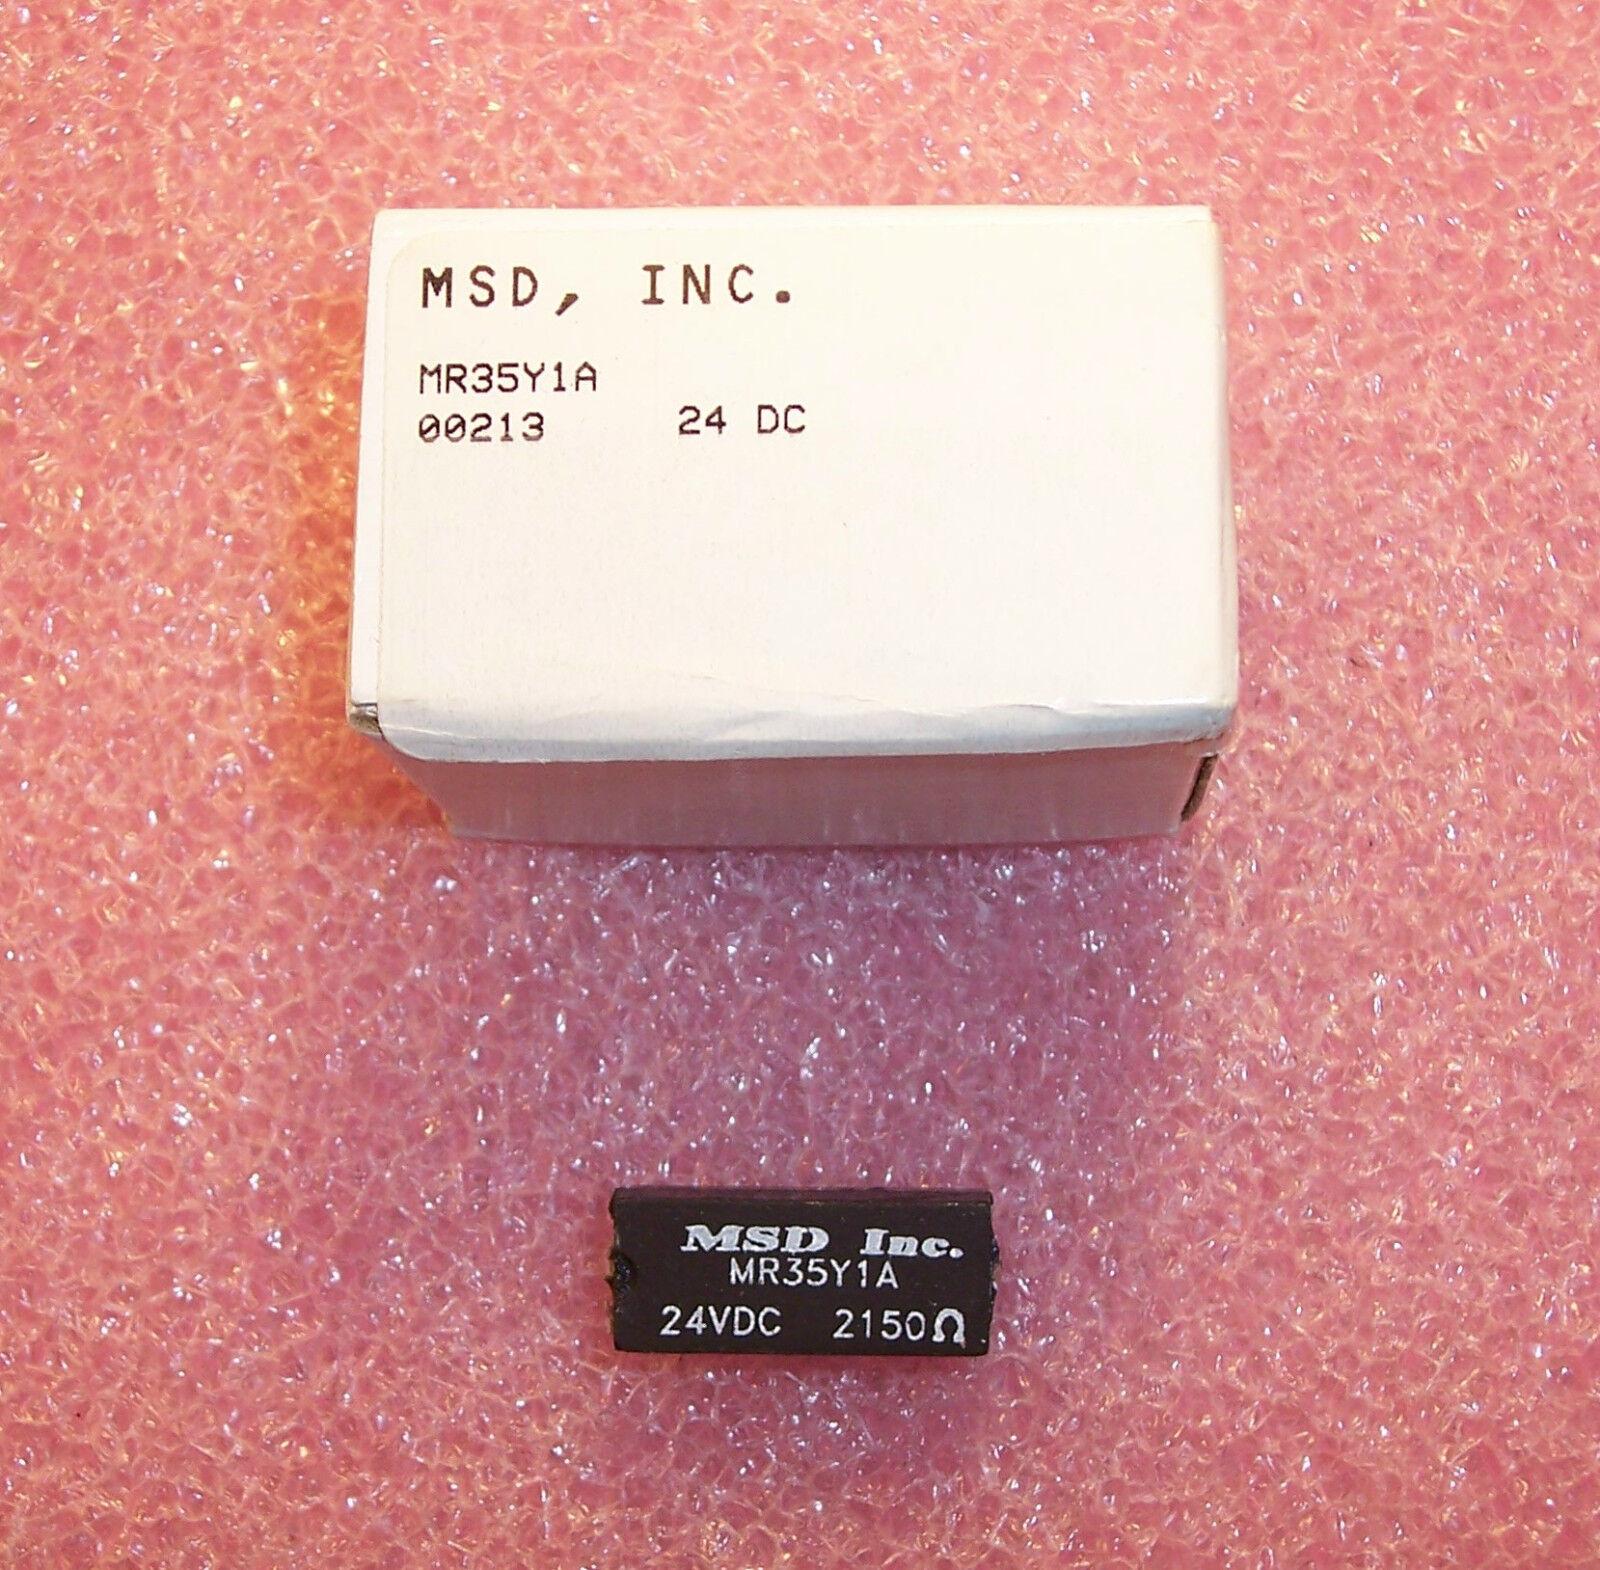 Qty 1 Mr35y1a 24v Msd Spst No Reed Relay 2150 Ohm Nos Ebay 5v Spdt Norton Secured Powered By Verisign